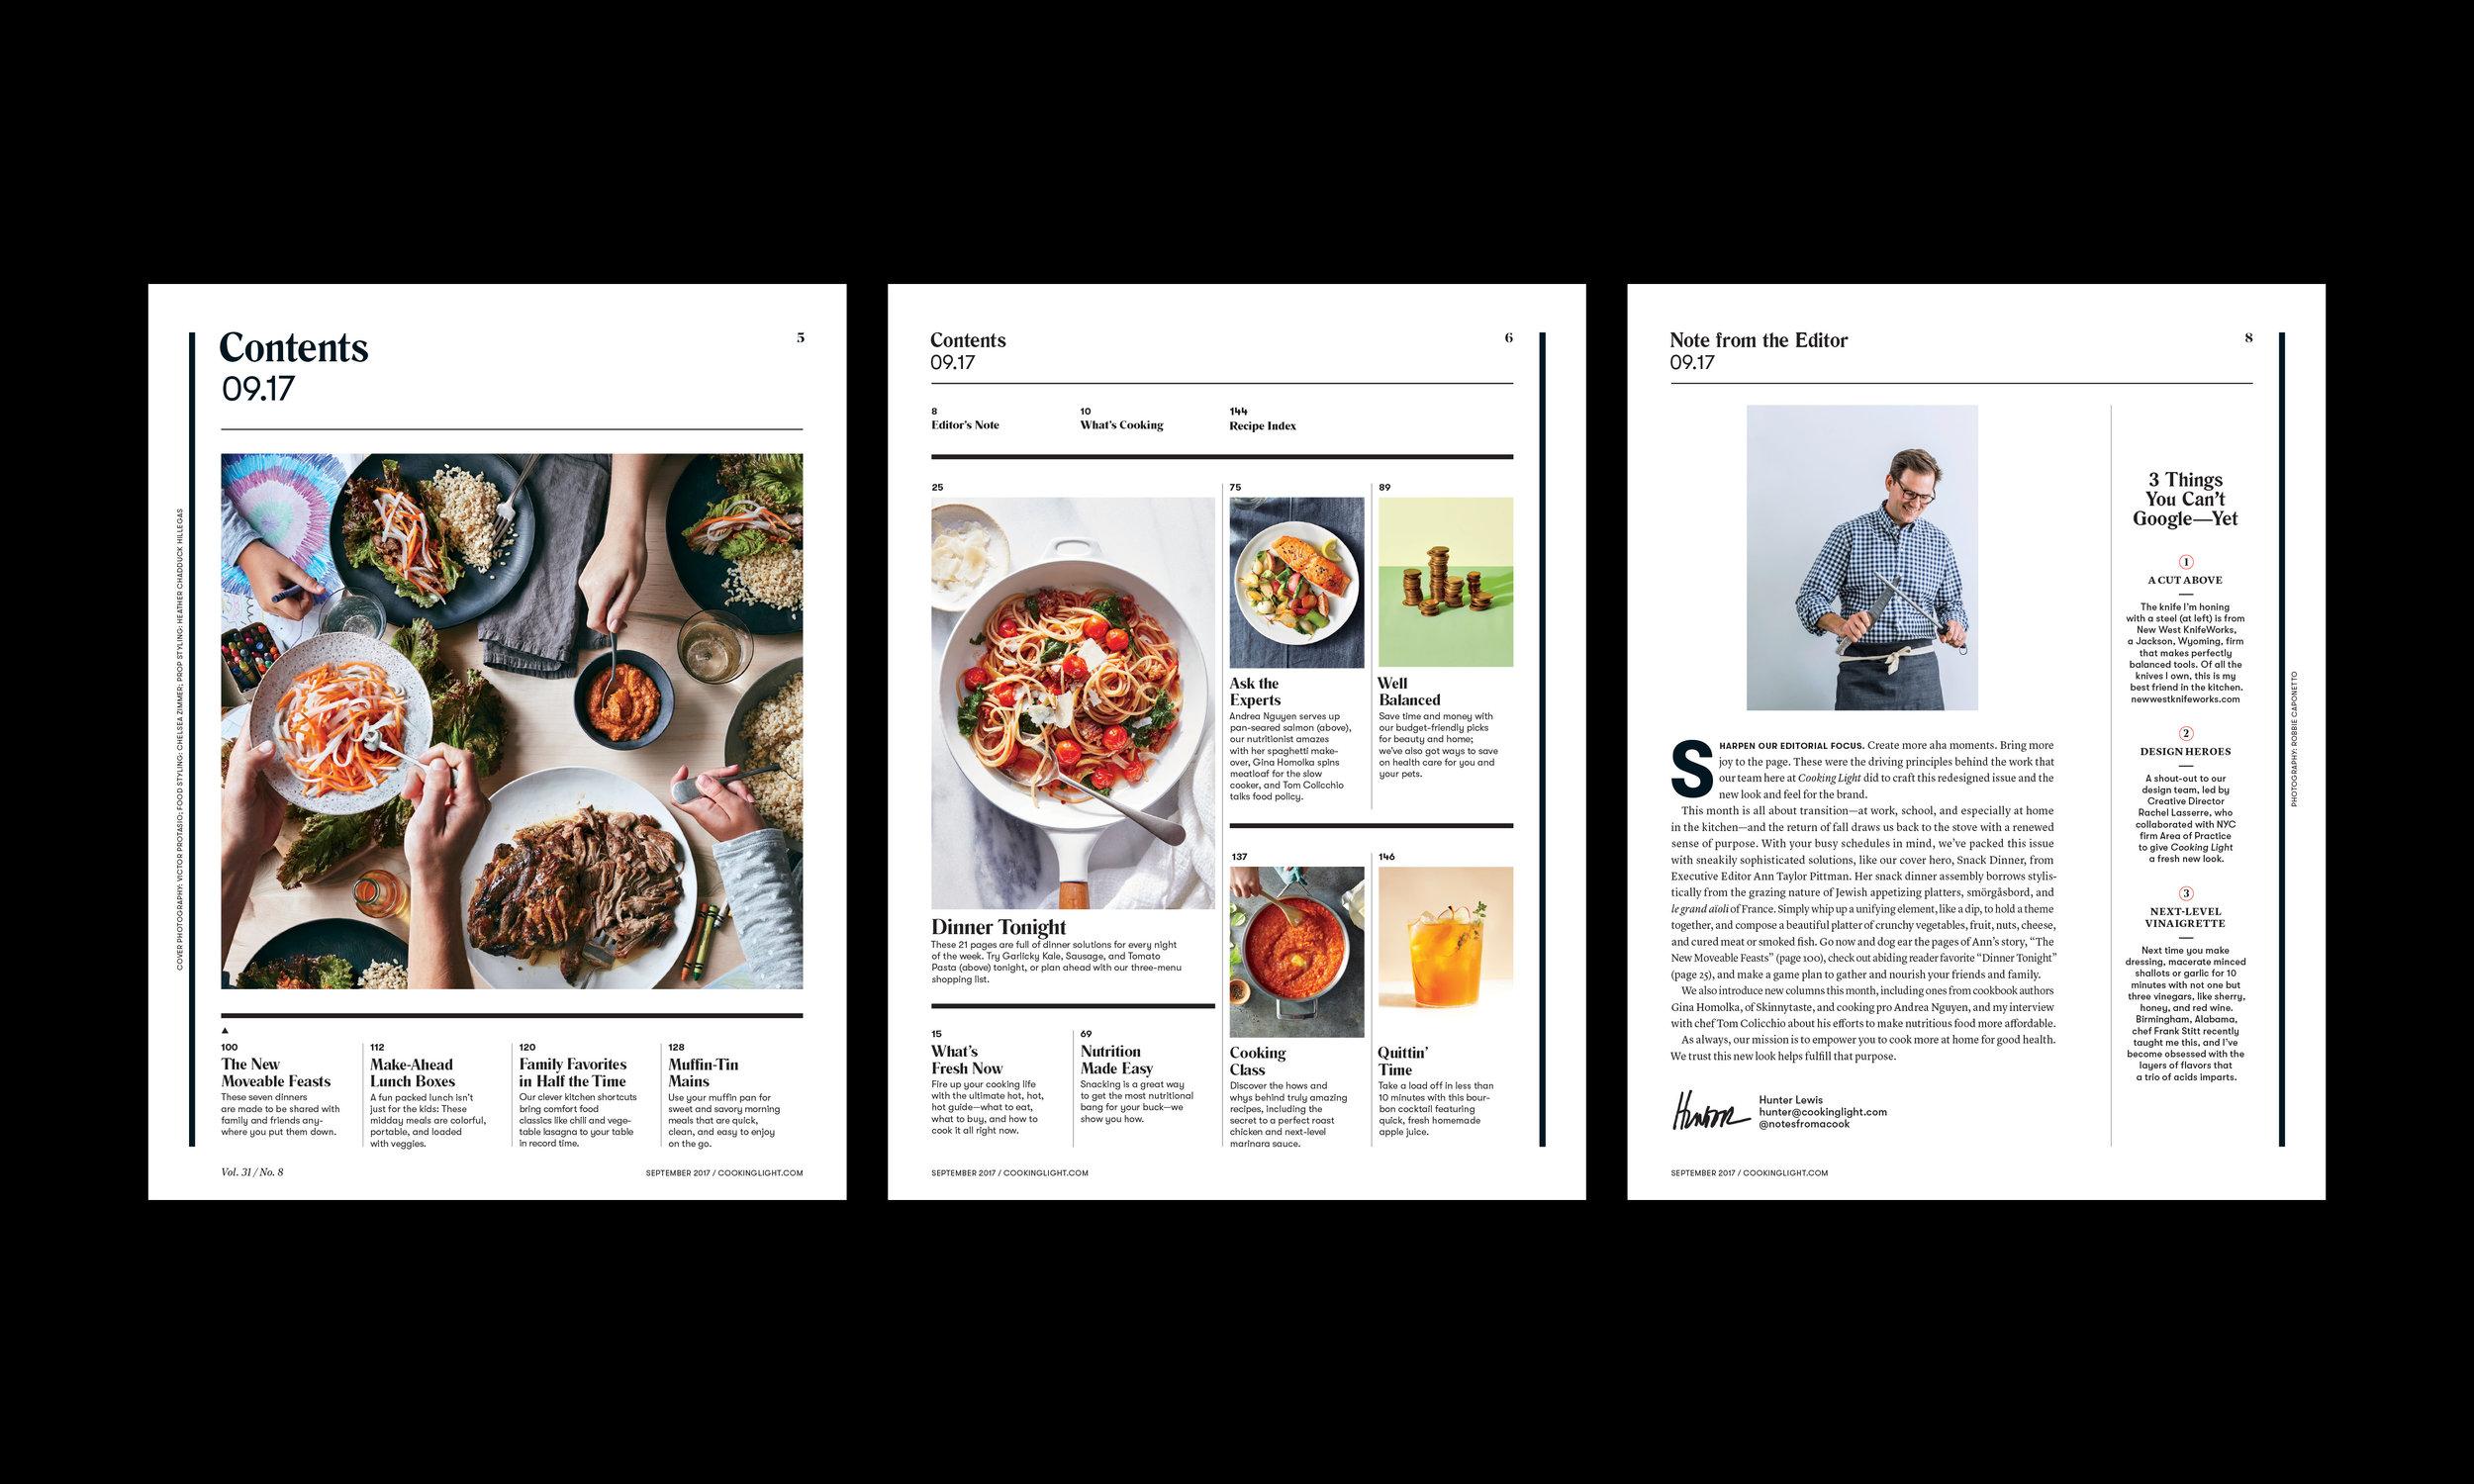 cookinglight_redesign_slides4.jpg